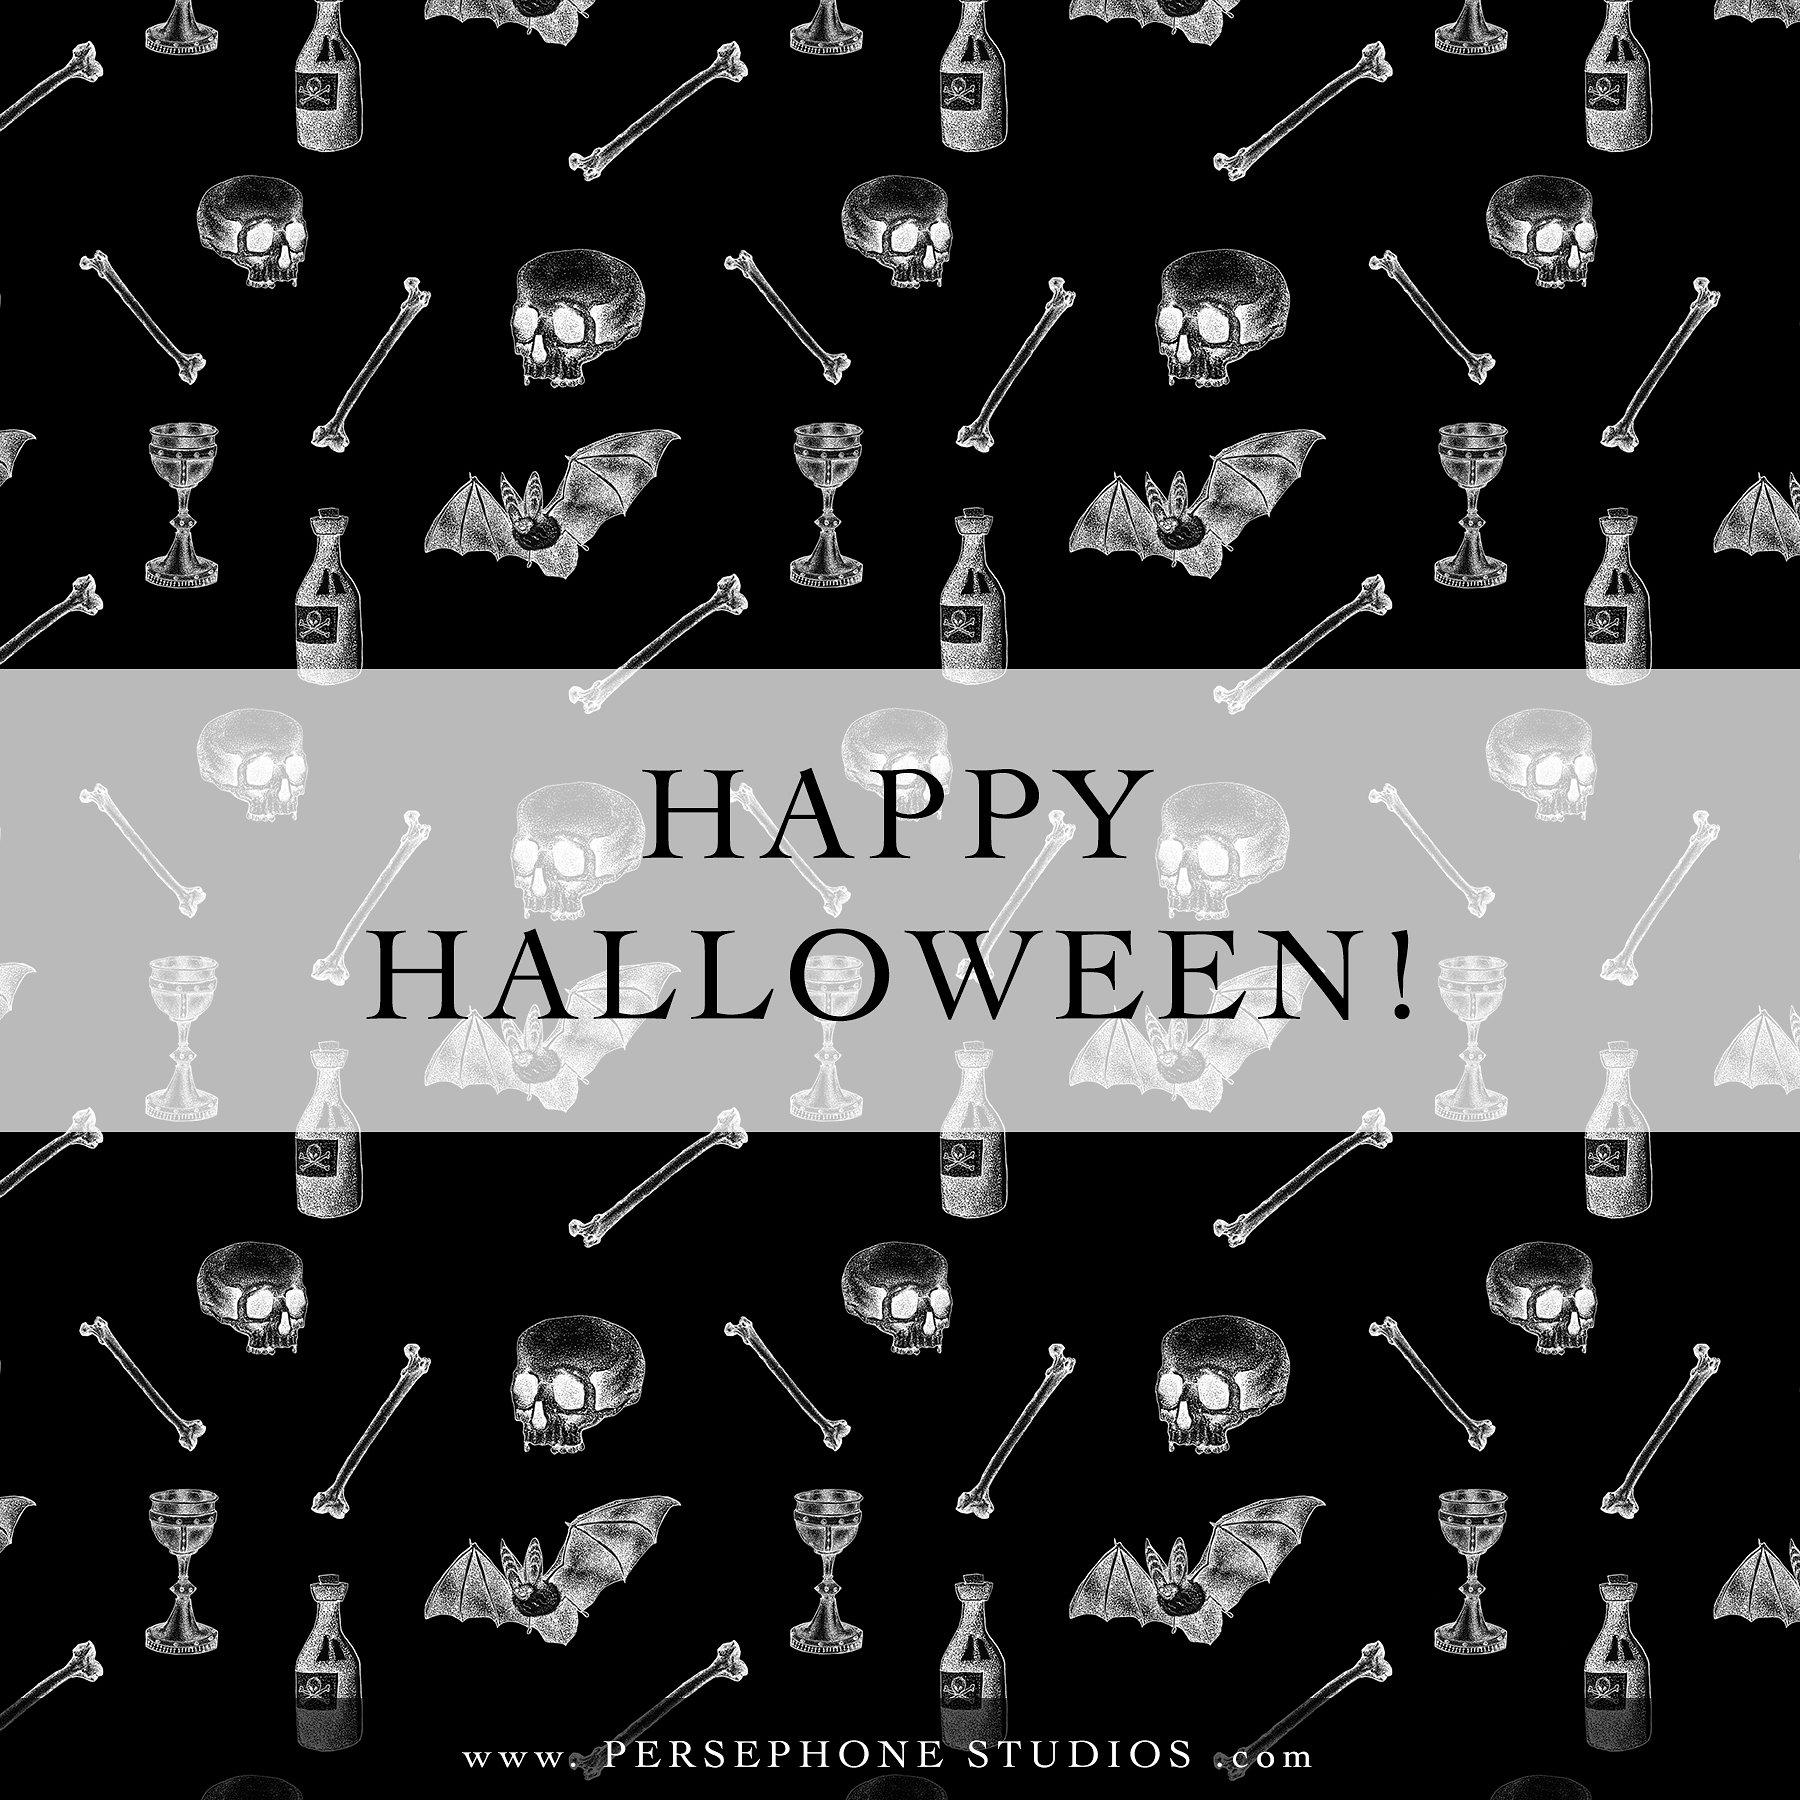 happy-halloween-by-persephone-studios.jpg